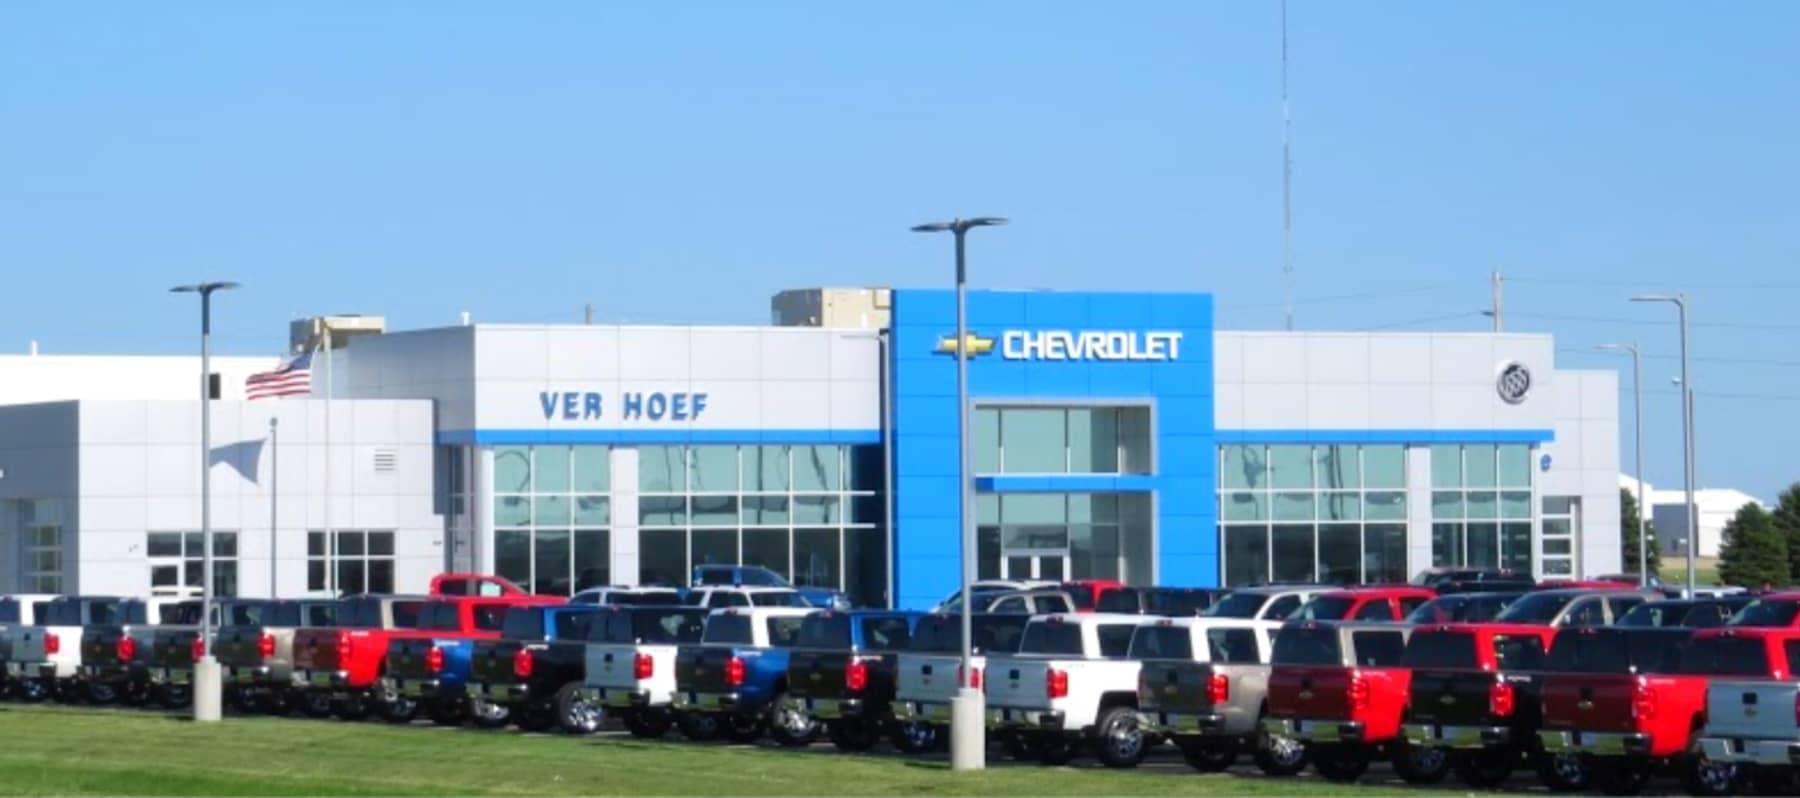 Ver Hoef Chevrolet Buick Dealer exterior